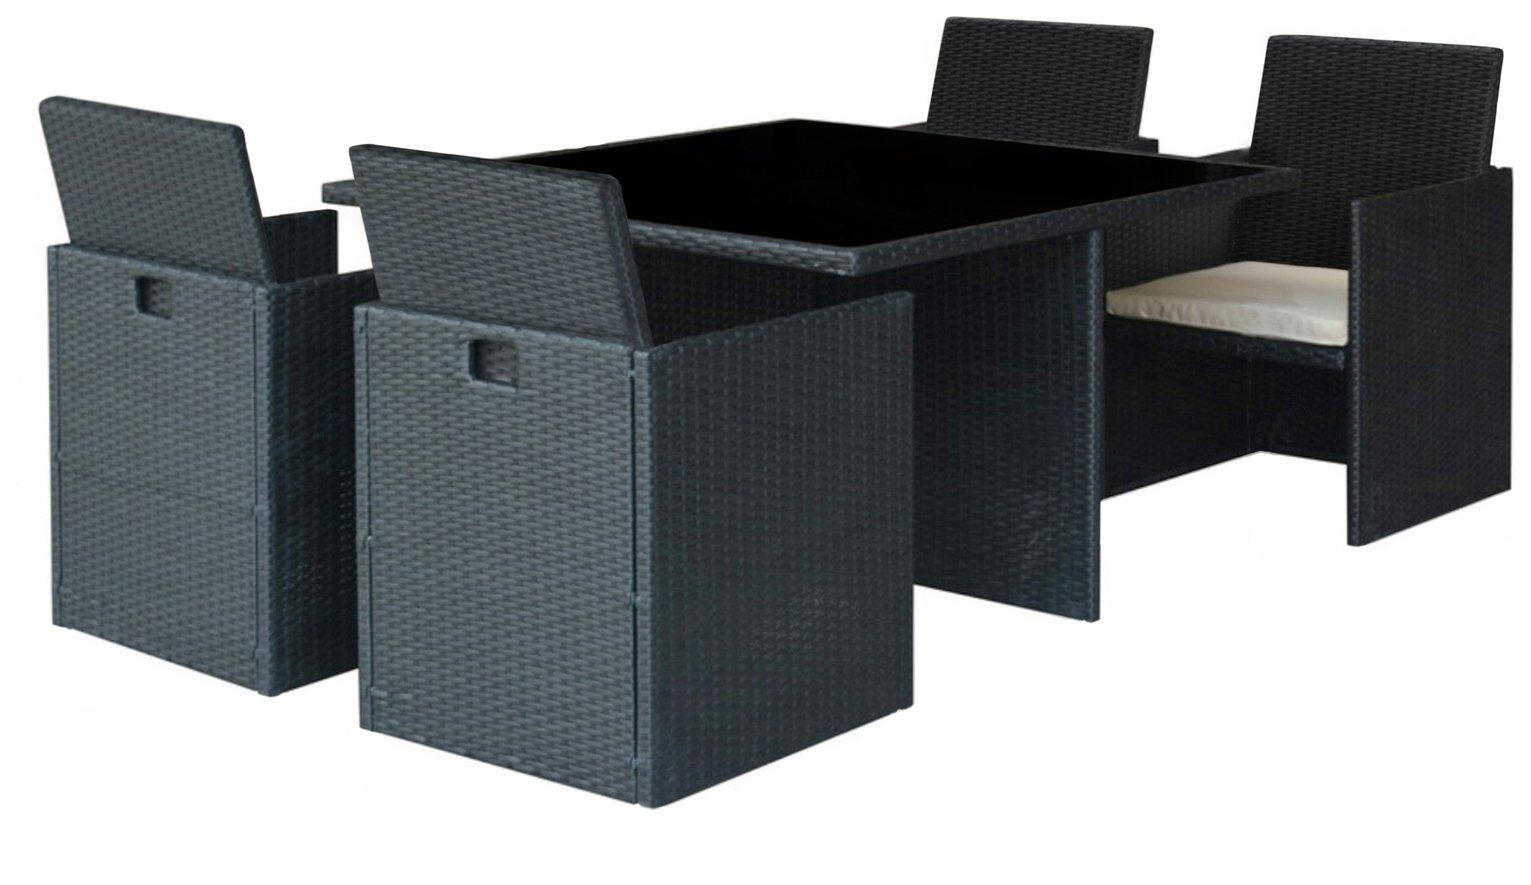 Cube Rattan Effect - 4 Seater Patio Set - Black